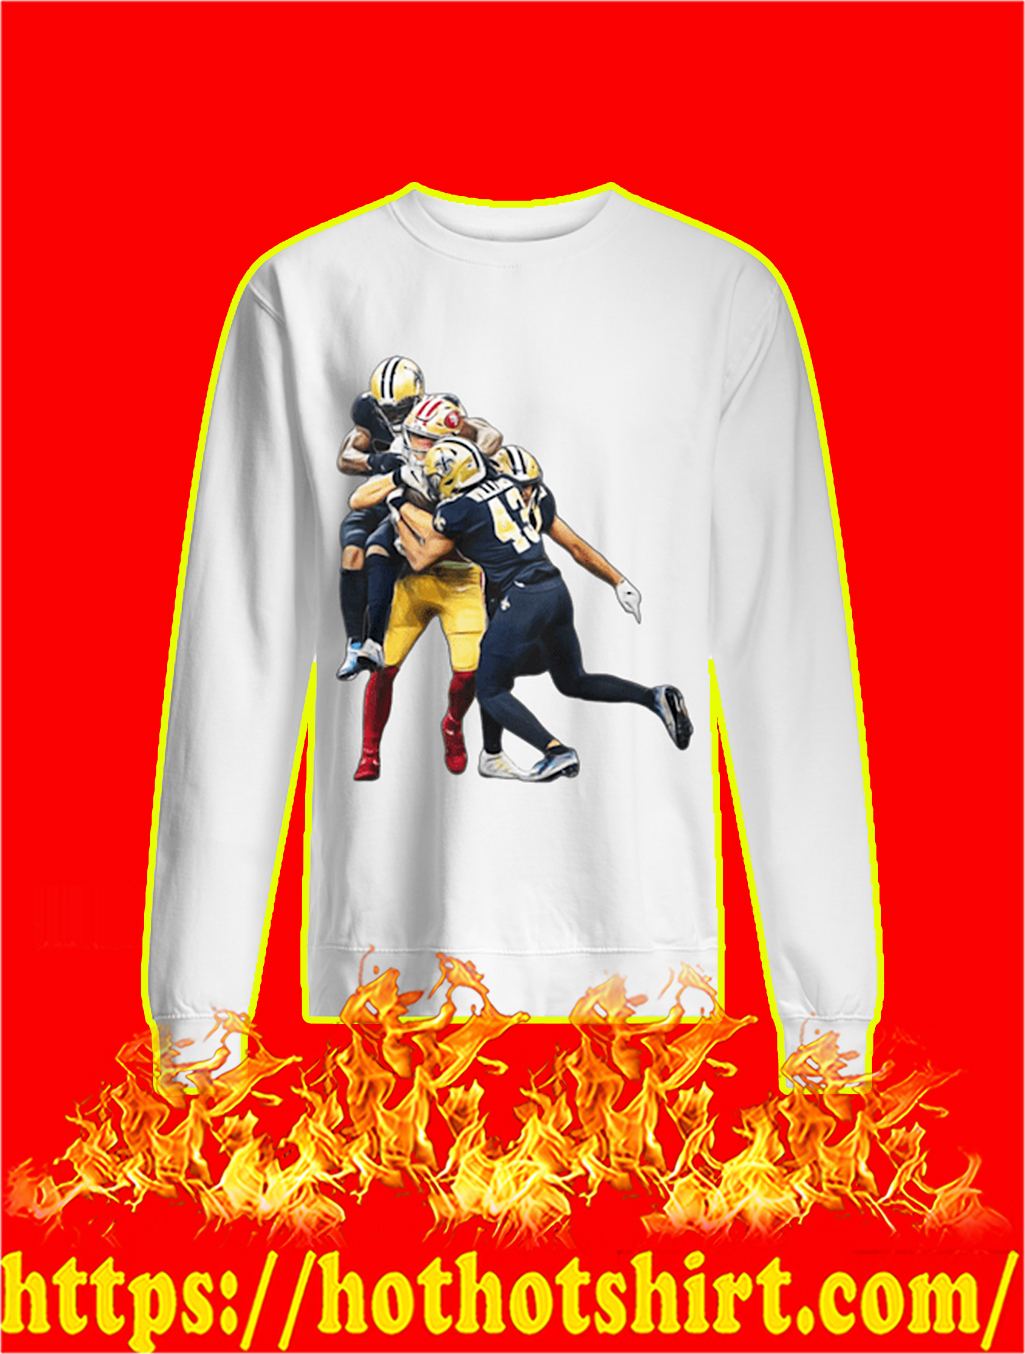 49ers' George Kittle on the catch Saints sweatshirt